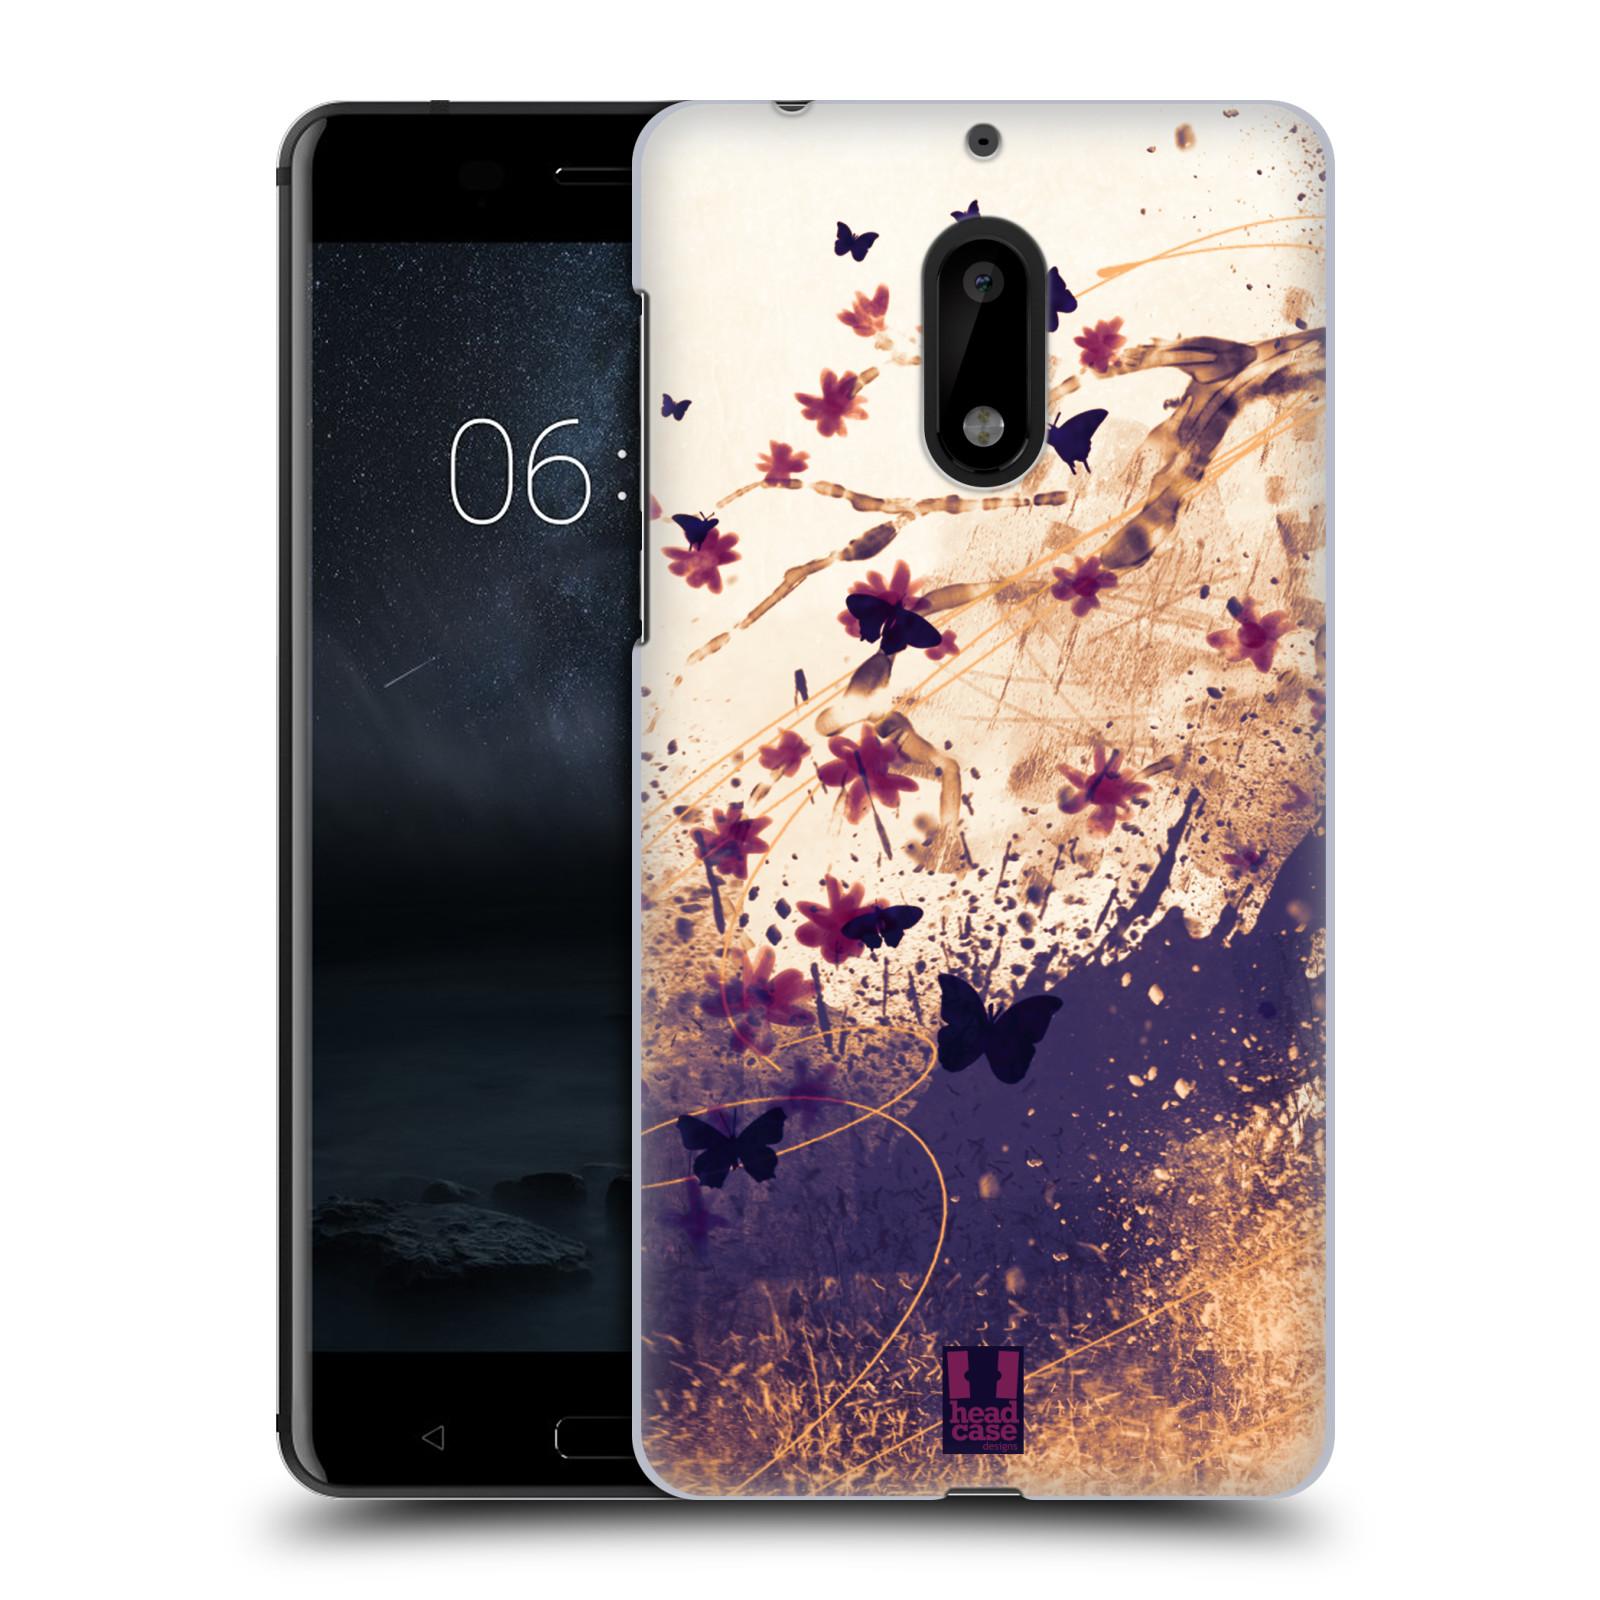 Plastové pouzdro na mobil Nokia 6 - Head Case MOTÝLCI (Plastový kryt či obal na mobilní telefon Nokia 6 (Dual SIM))